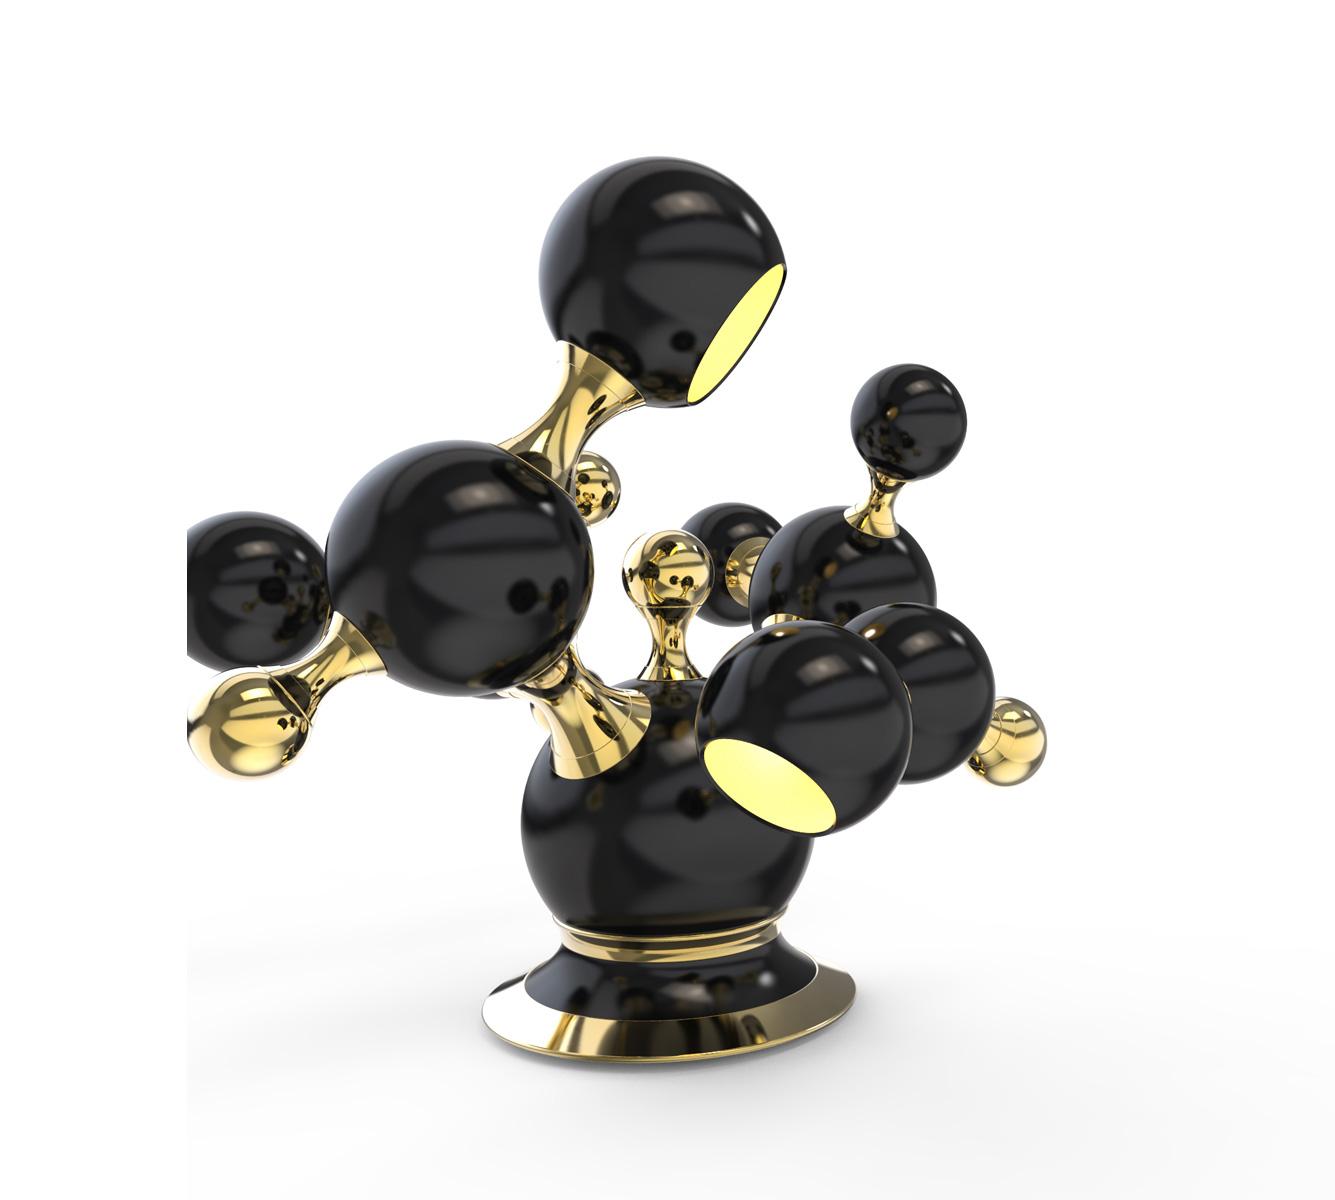 ATOMIC TABLE LAMP By DELIGHTFULL DEMORAIS INTERNATIONAL